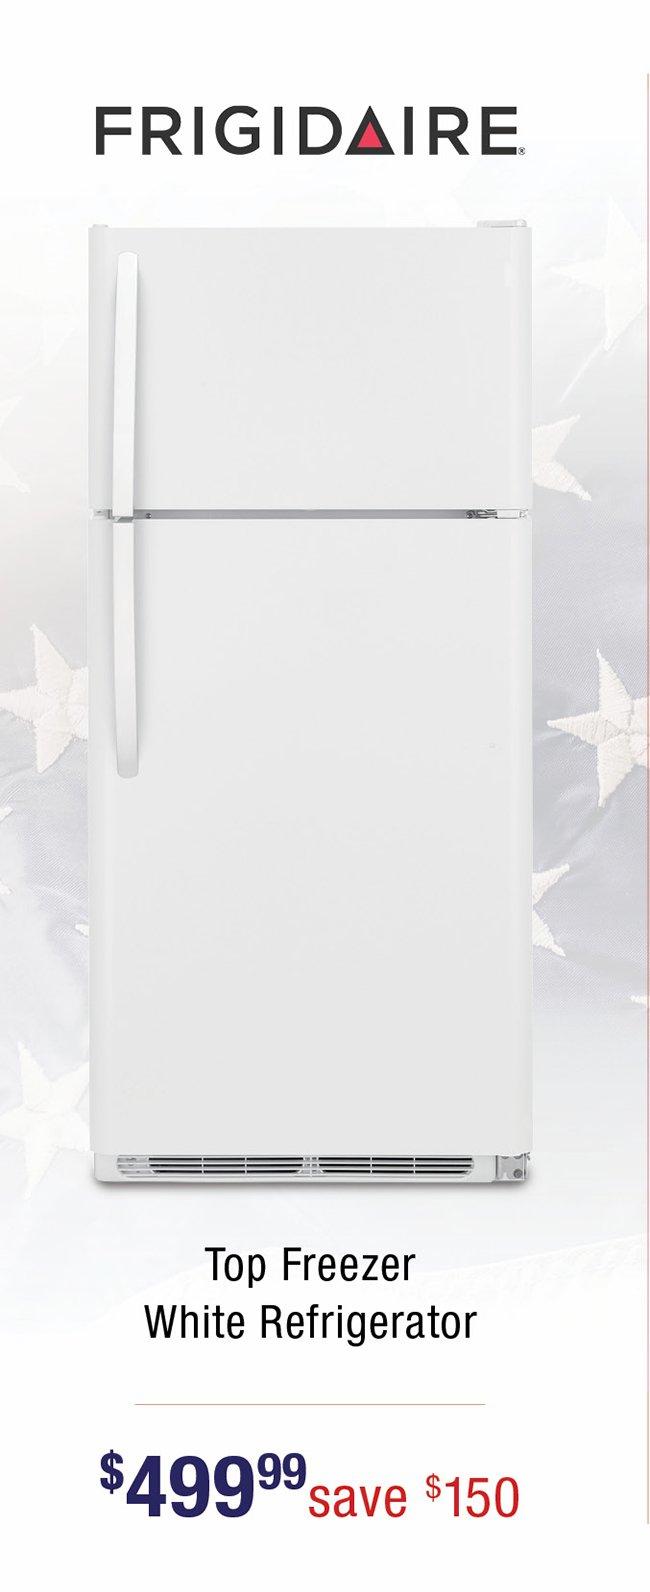 Figidaire-white-refrigerator